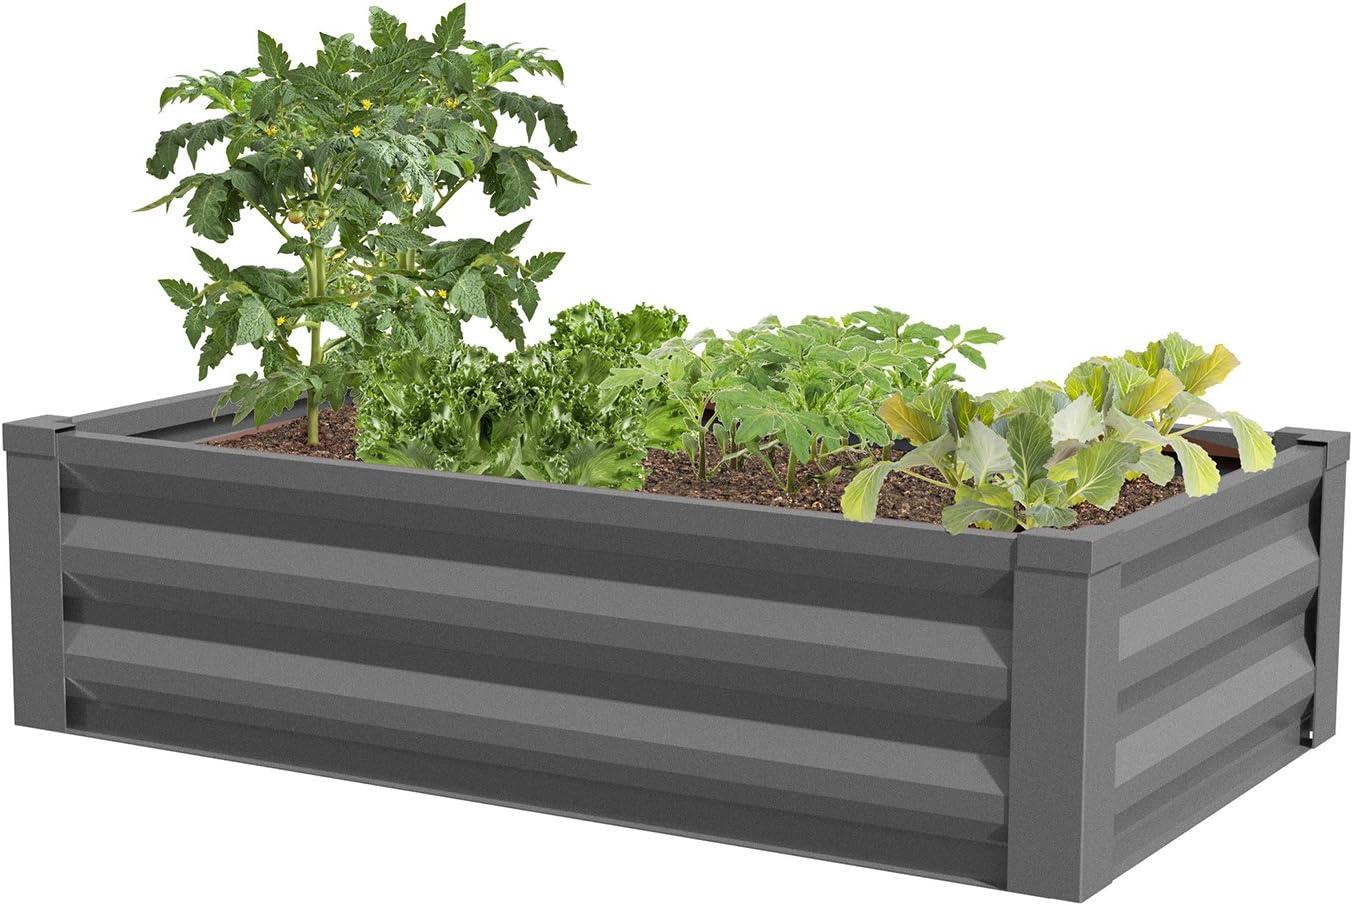 Greenes Fence Powder-Coated Metal Raised Garden Bed Planter 24 W x 48 L